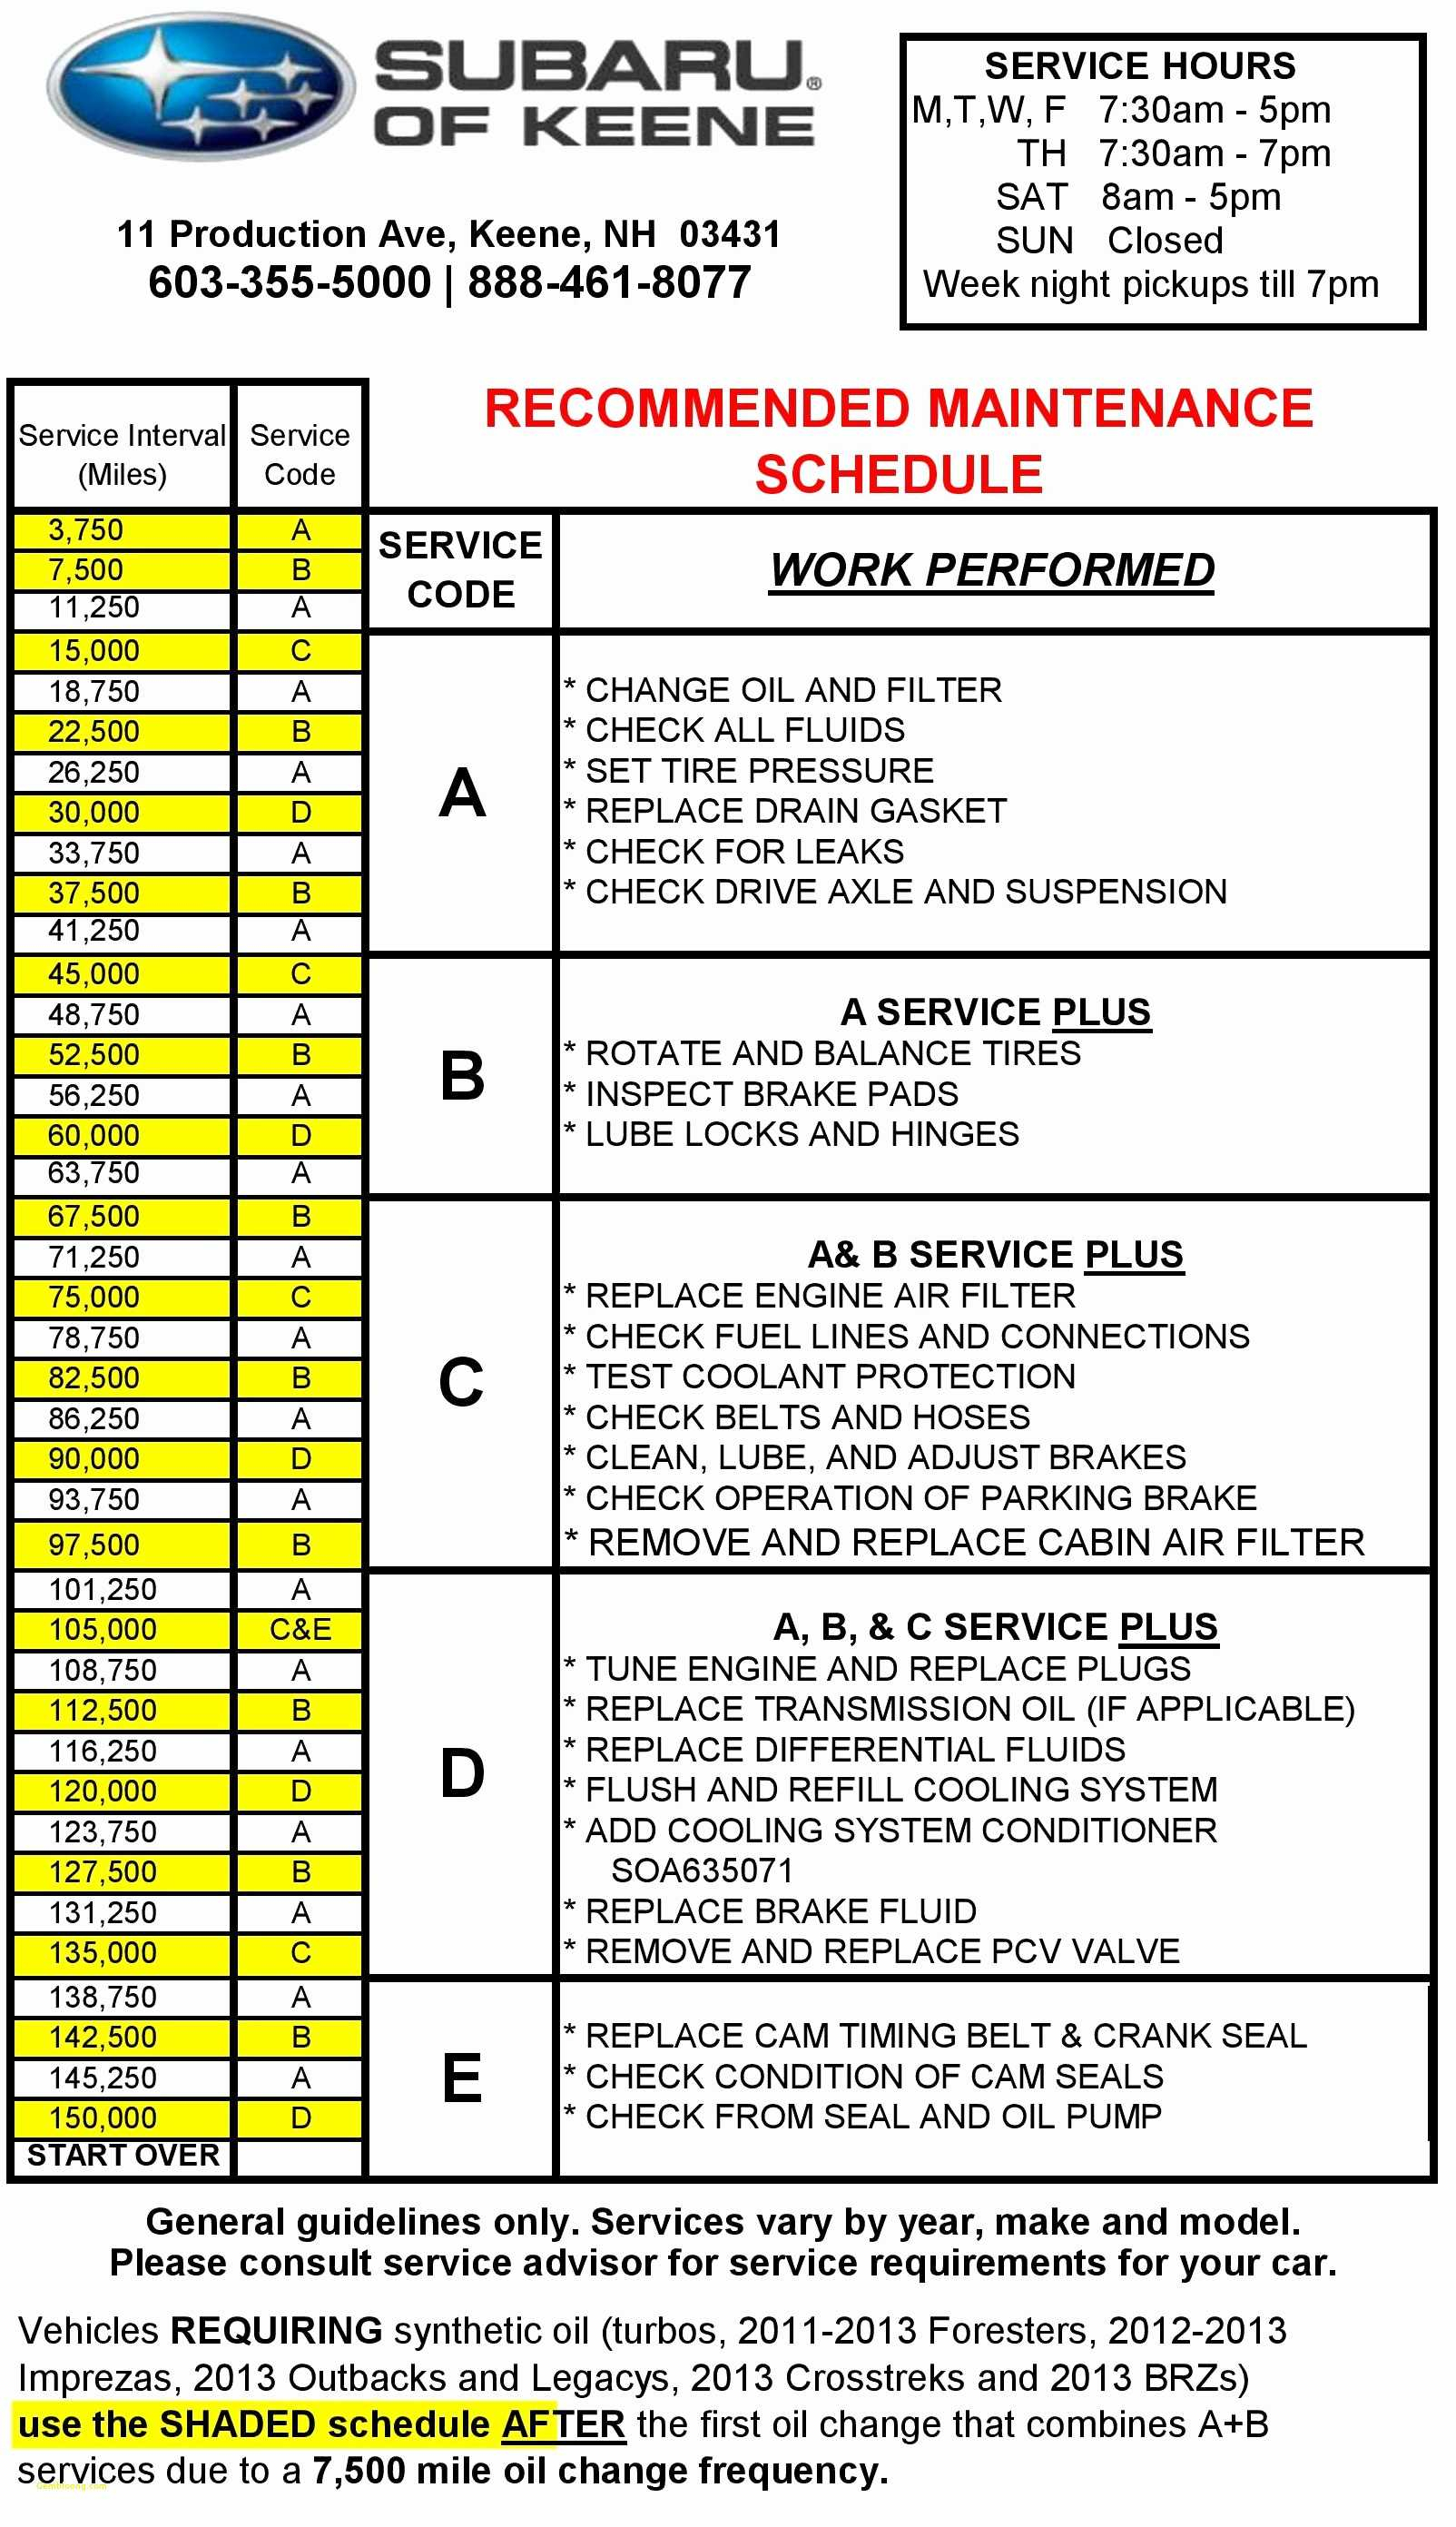 Ashrae 62.1 2013 Ventilation Calculator Spreadsheet Intended For Vehicle Fleet Management Spreadsheet  Awal Mula Ashrae 62.1 2013 Ventilation Calculator Spreadsheet Printable Spreadshee Printable Spreadshee